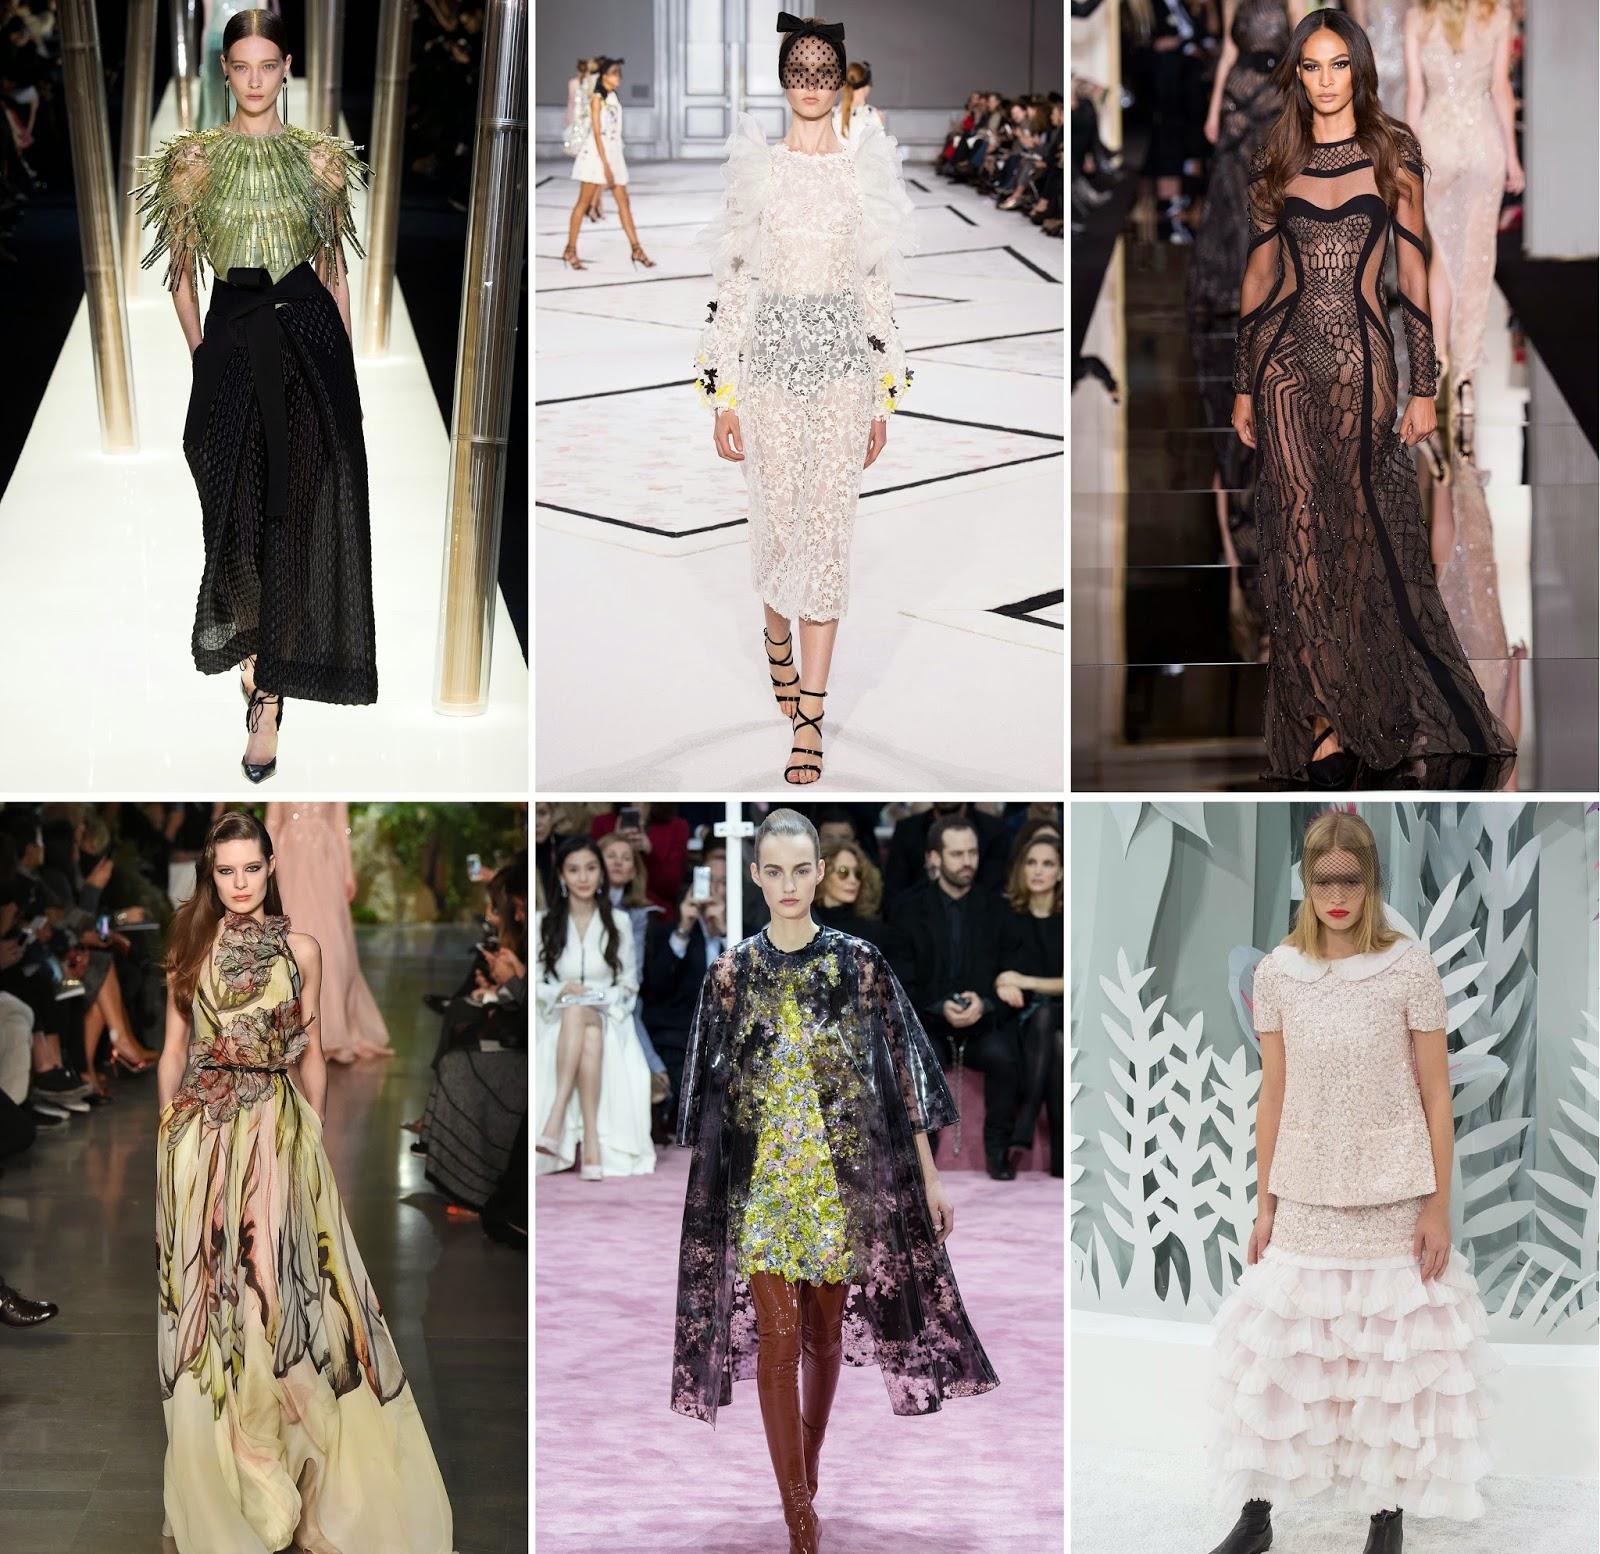 giambattista-valli-armani-versace-dior-chanel-elie-saab-haute-couture-paris-spring-2015